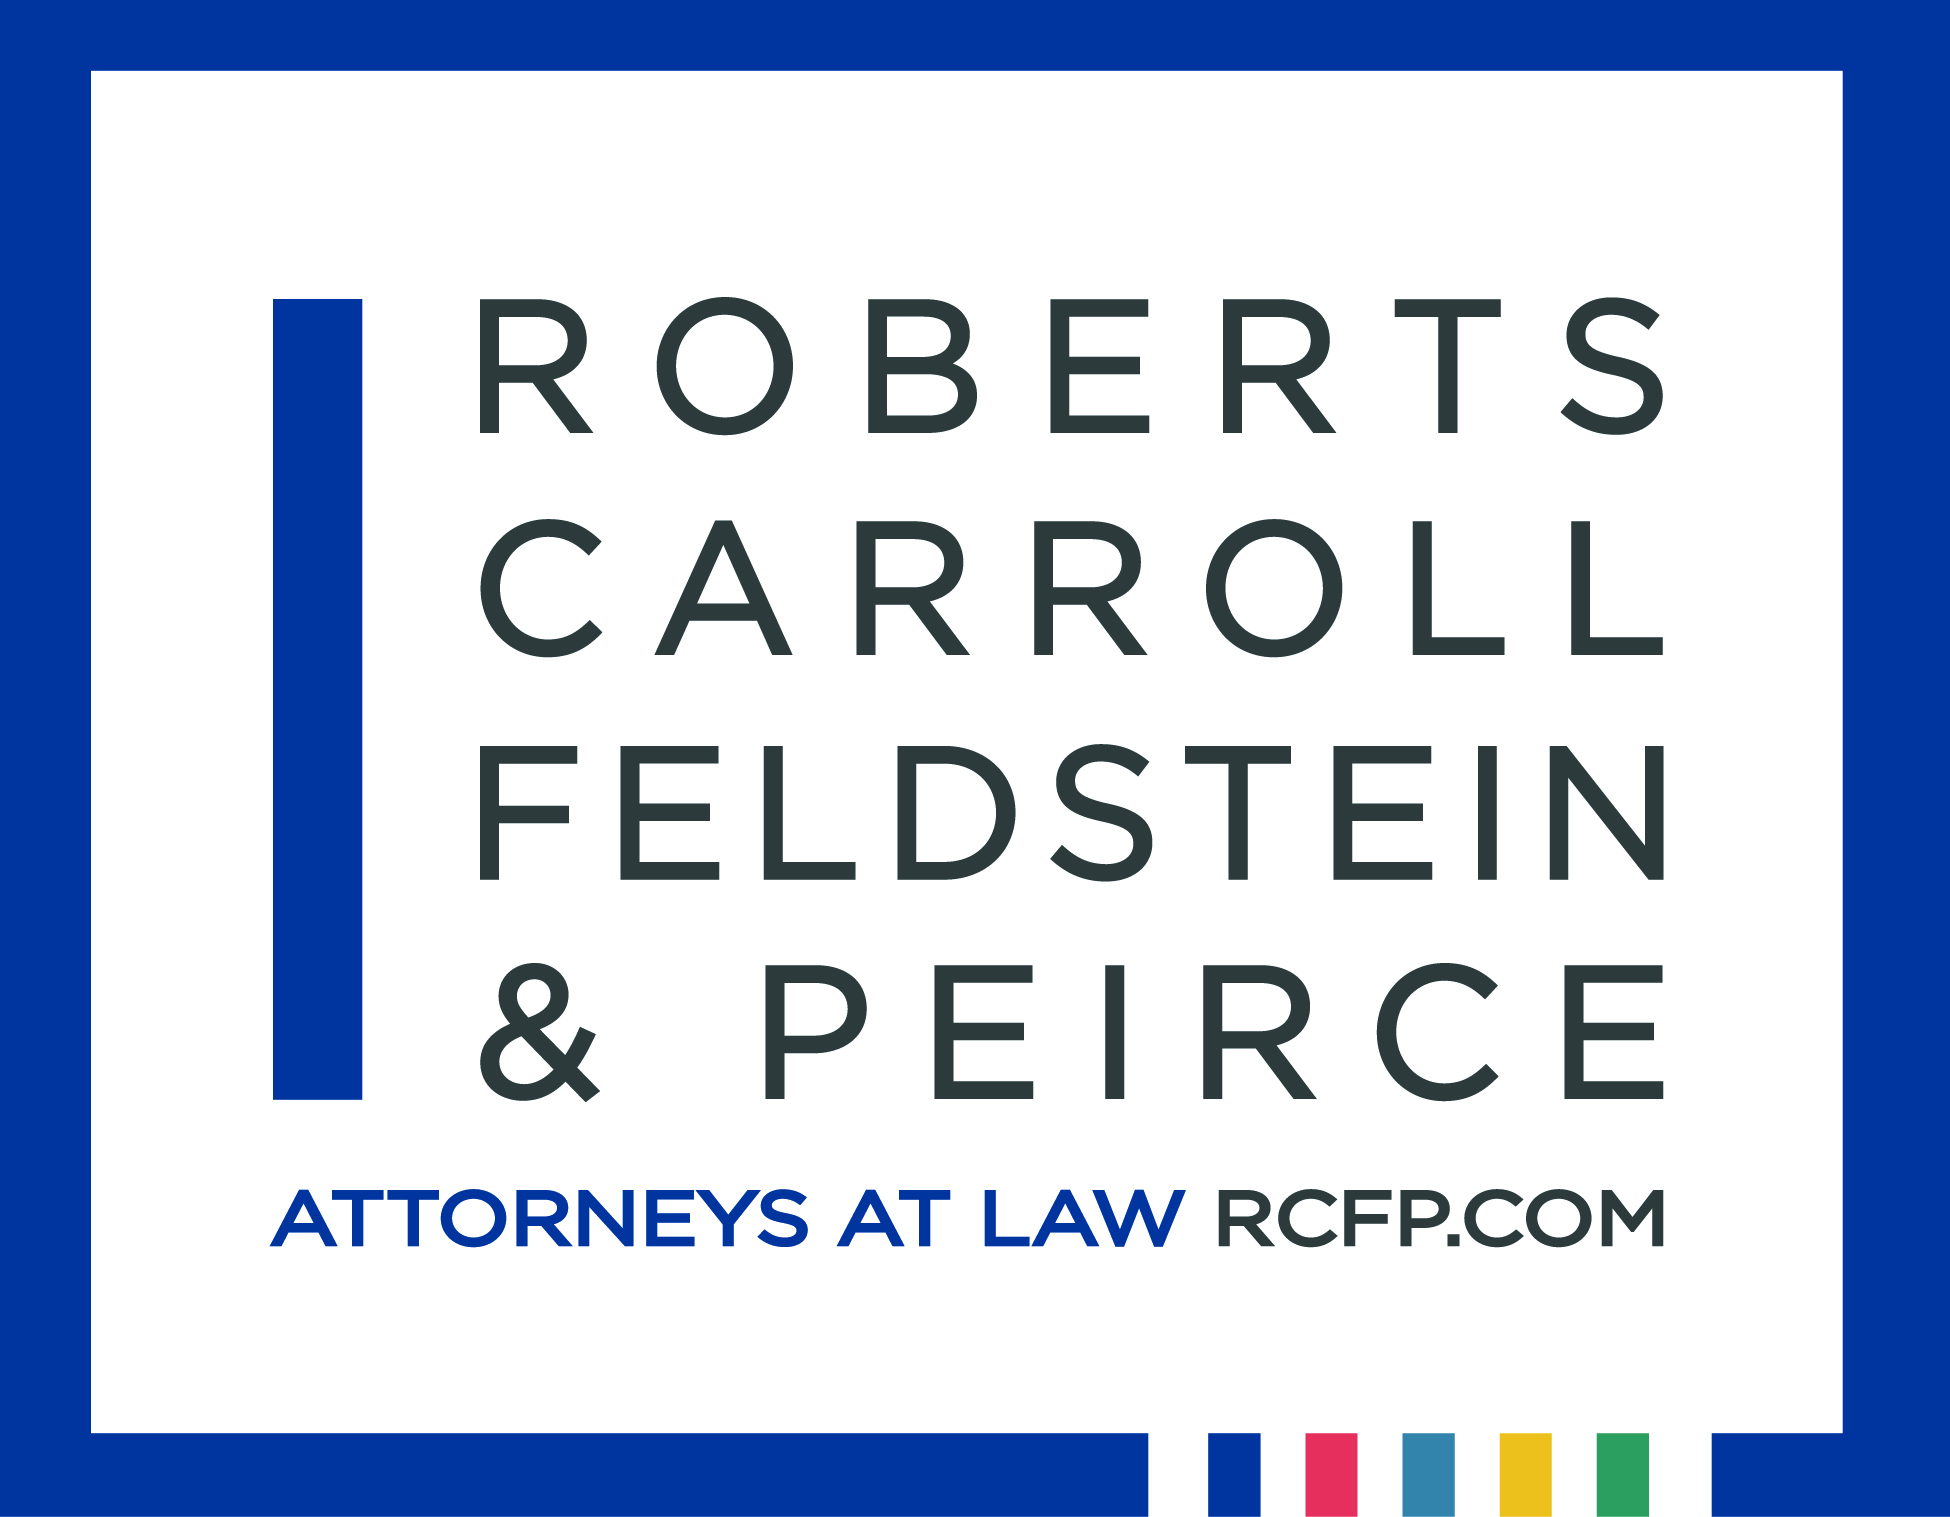 Roberts Carroll Feldstein Peirce